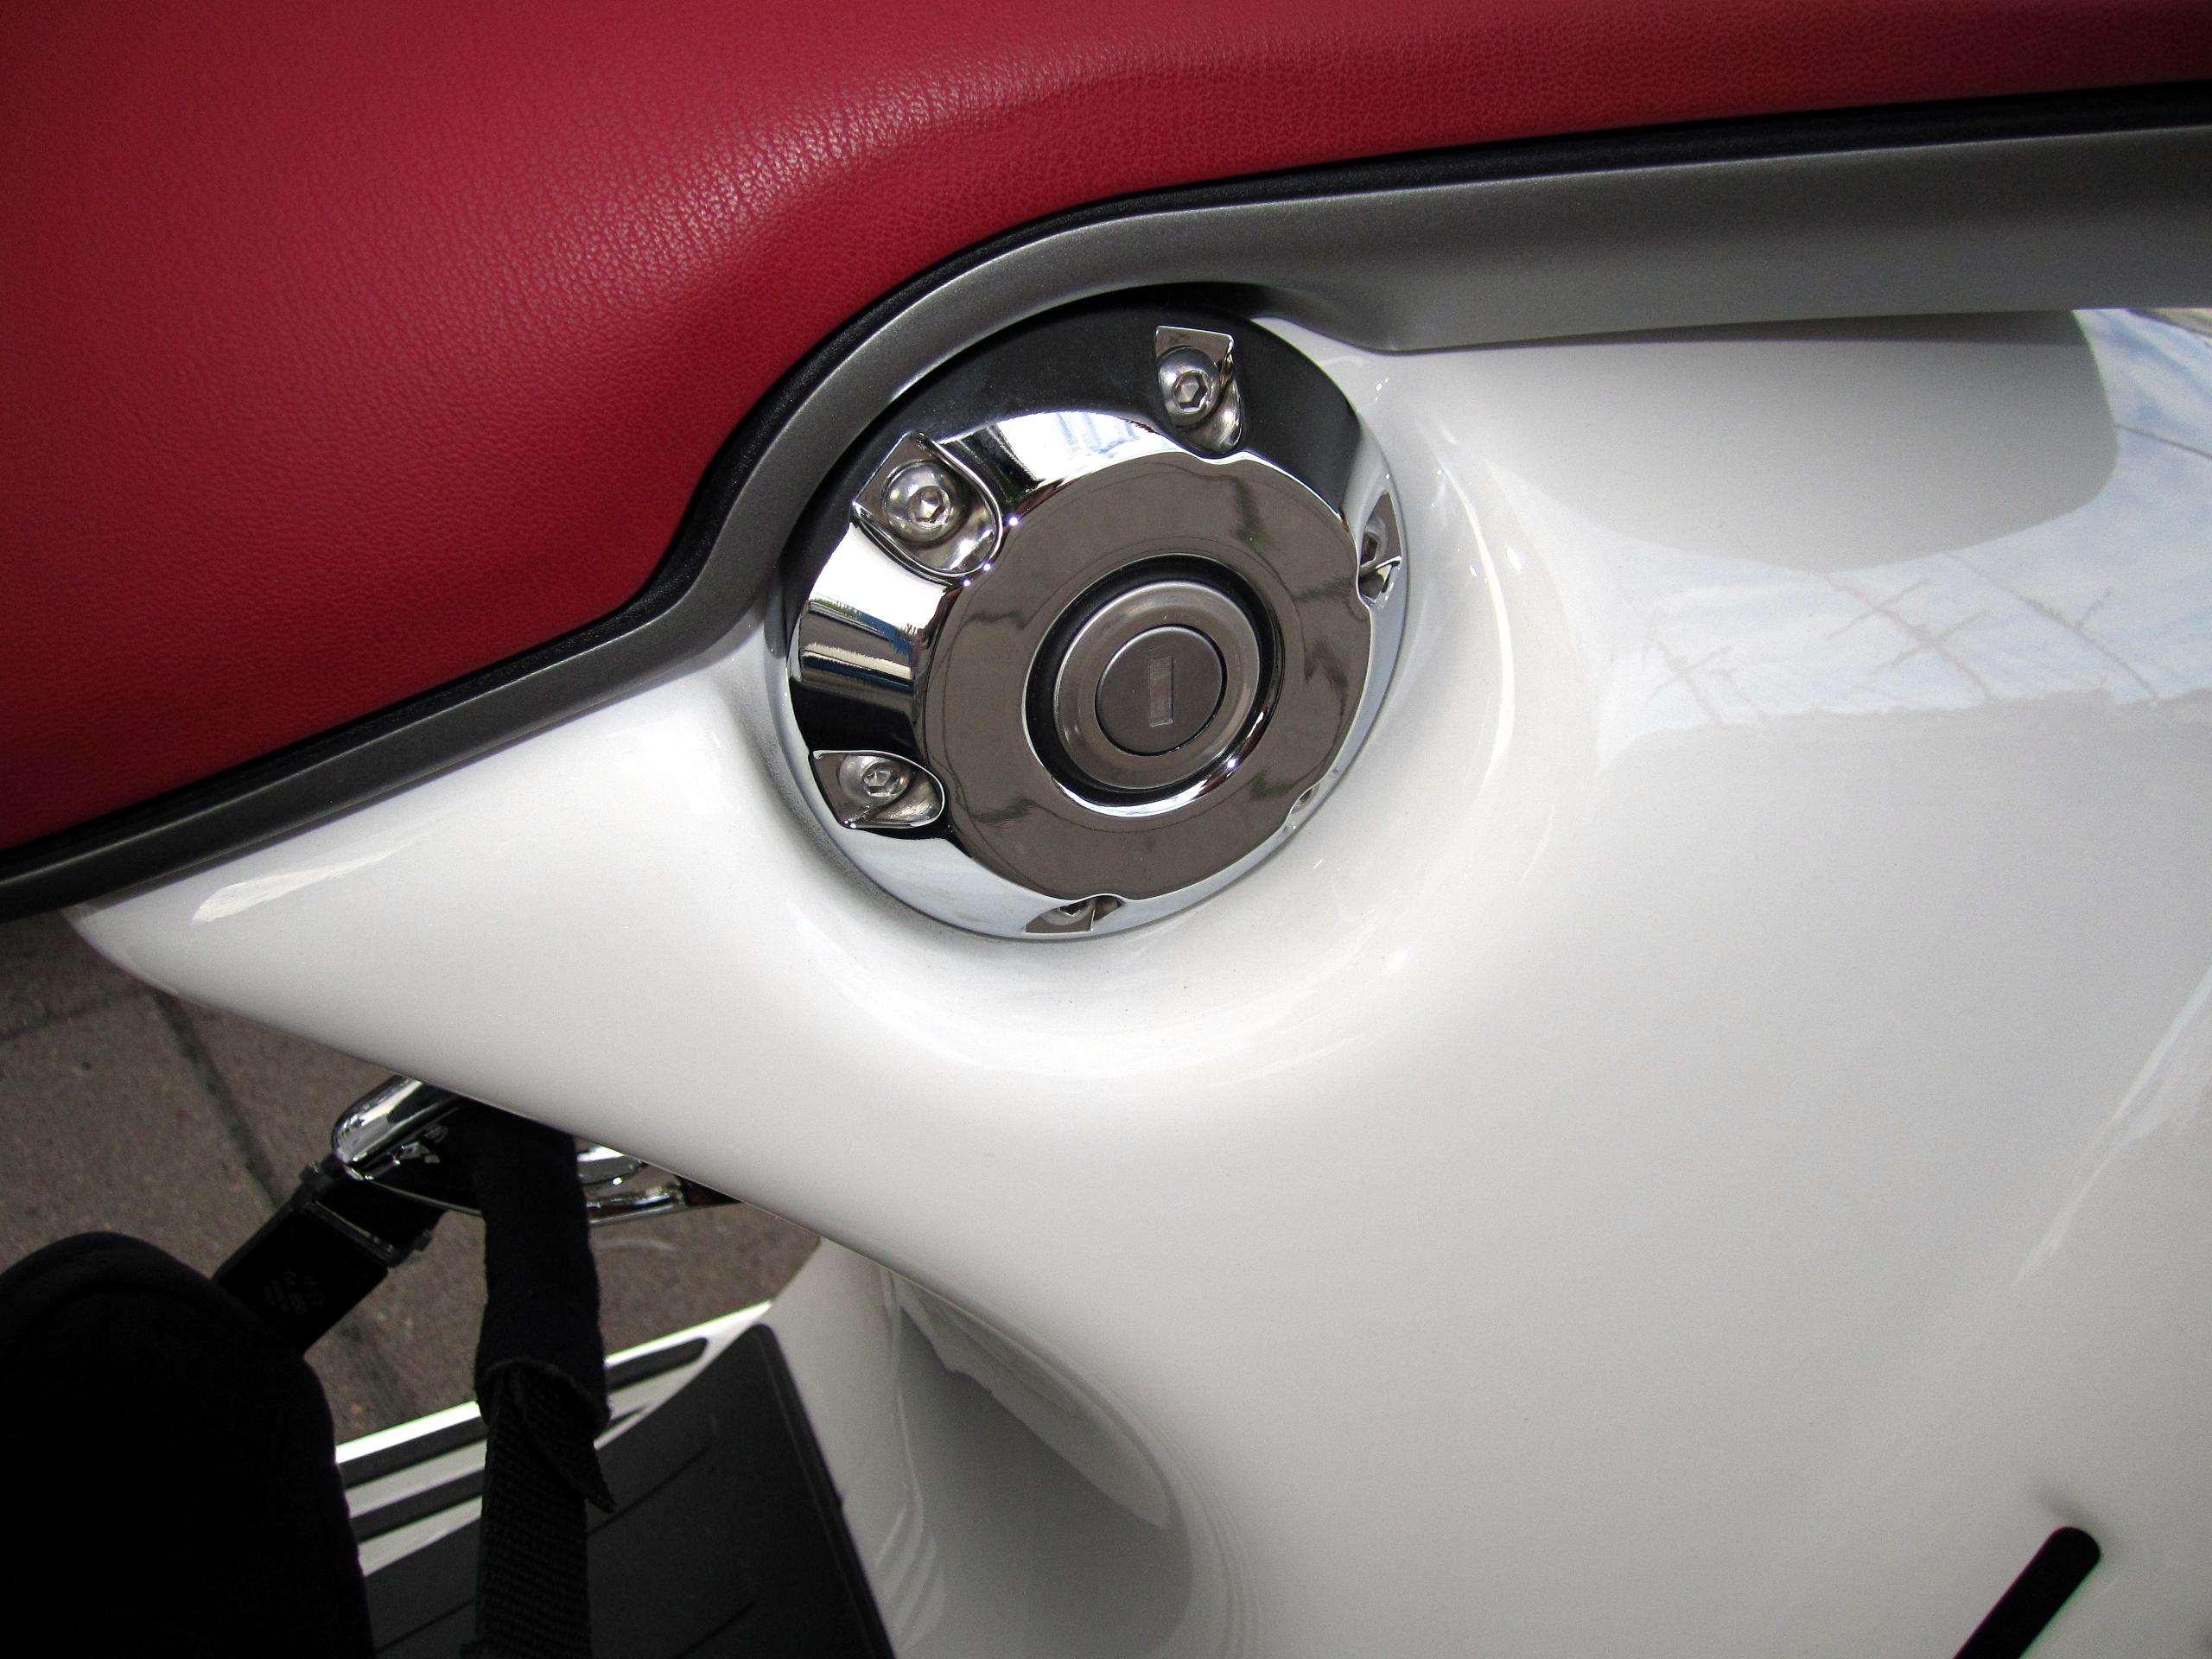 locksmithpros.com car service